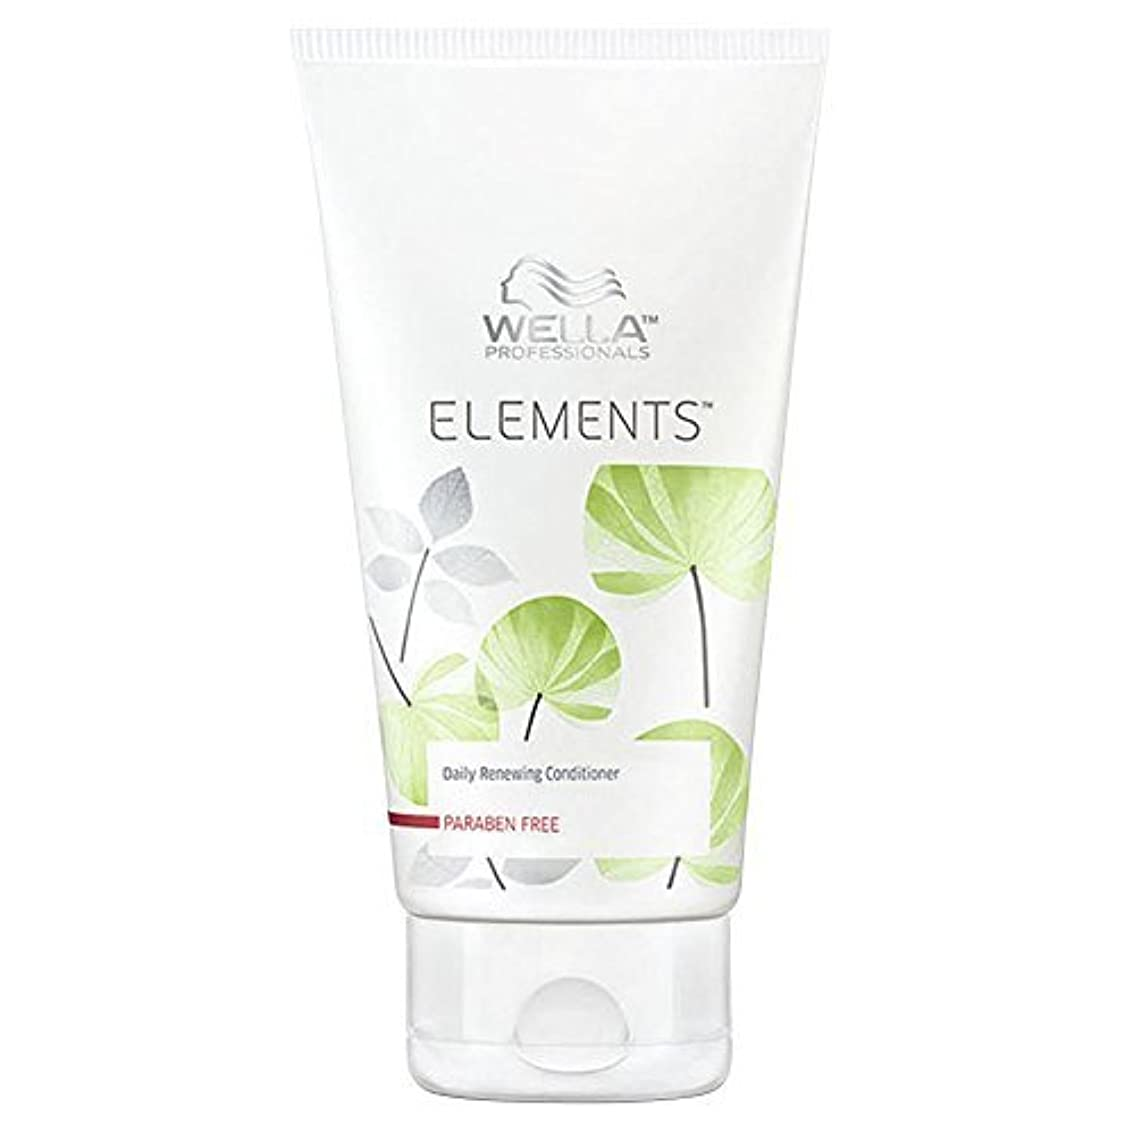 Wella Elements Daily Renewing Condioner 6.76 oz by Wella [並行輸入品]